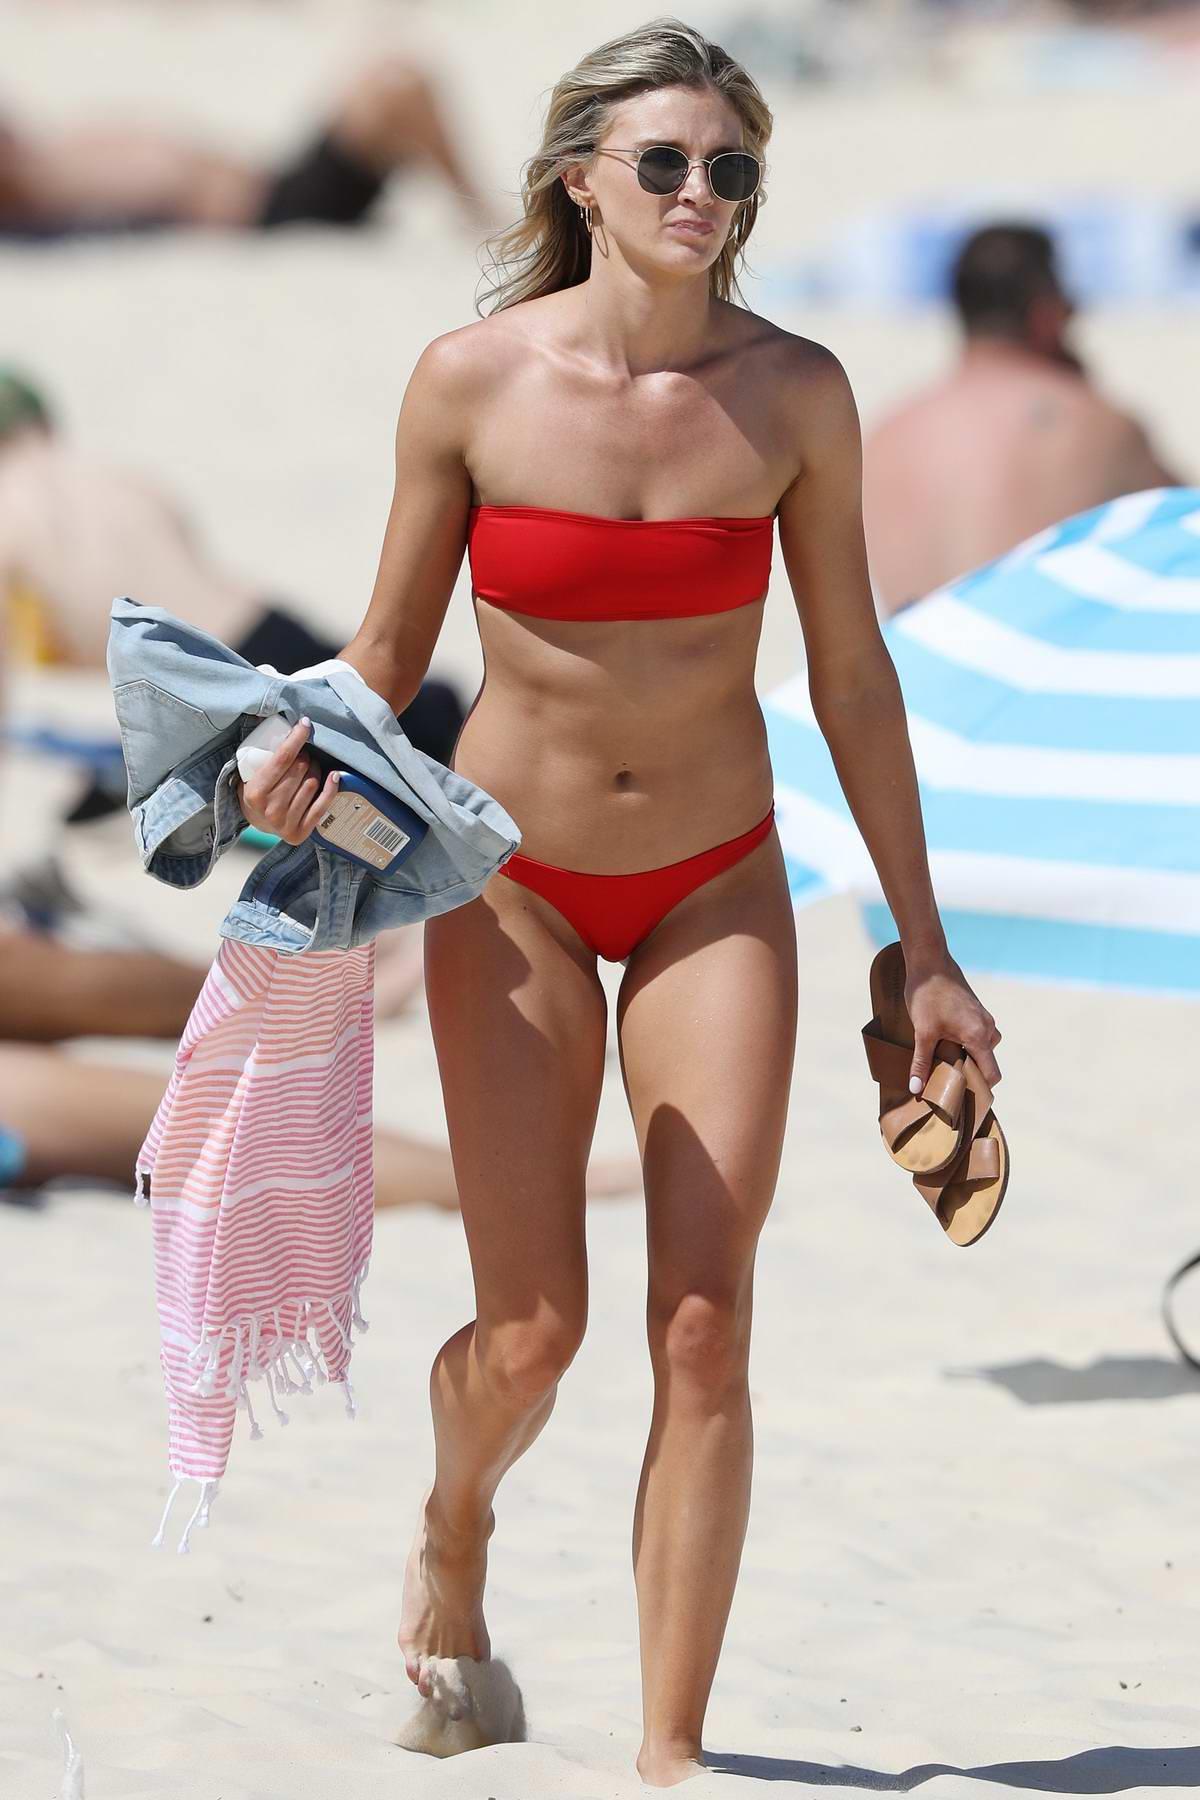 Amy Pejkovic in a red bikini on the beach in Sydney, Australia